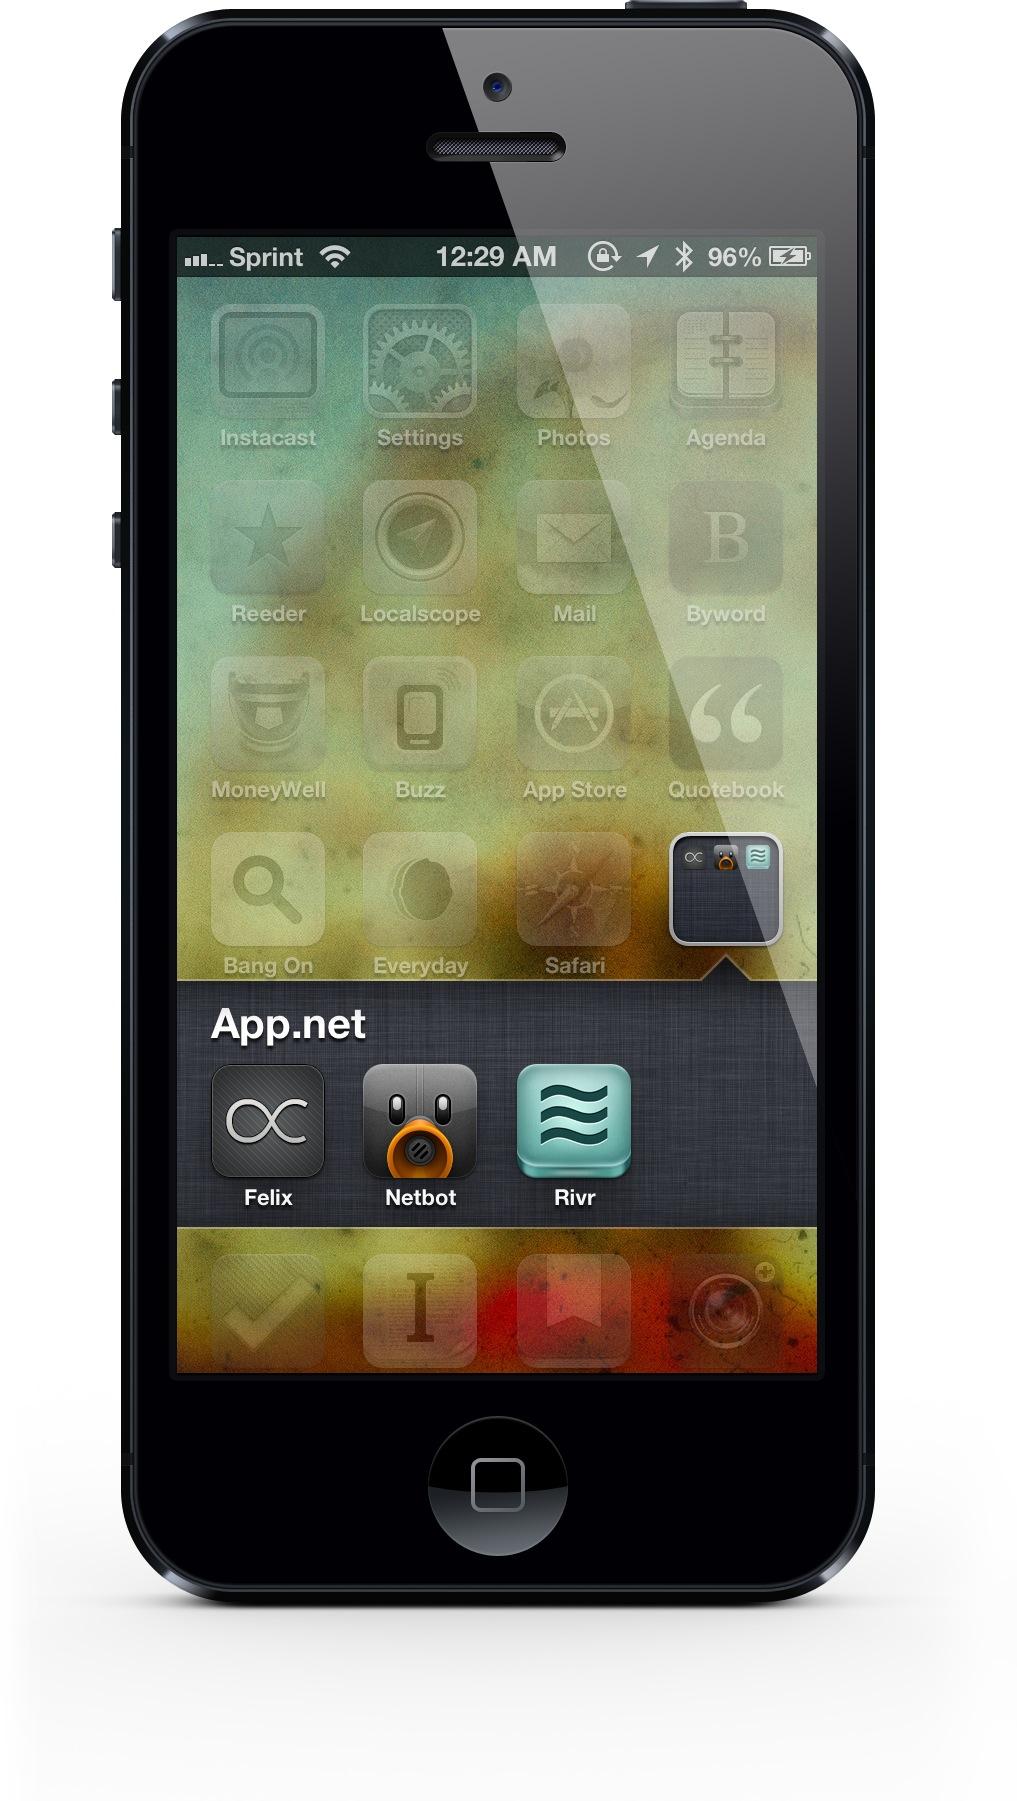 App Showdown: Netbot Vs. Felix Vs. Rivr: A Battle Of The App.net iPhone Apps